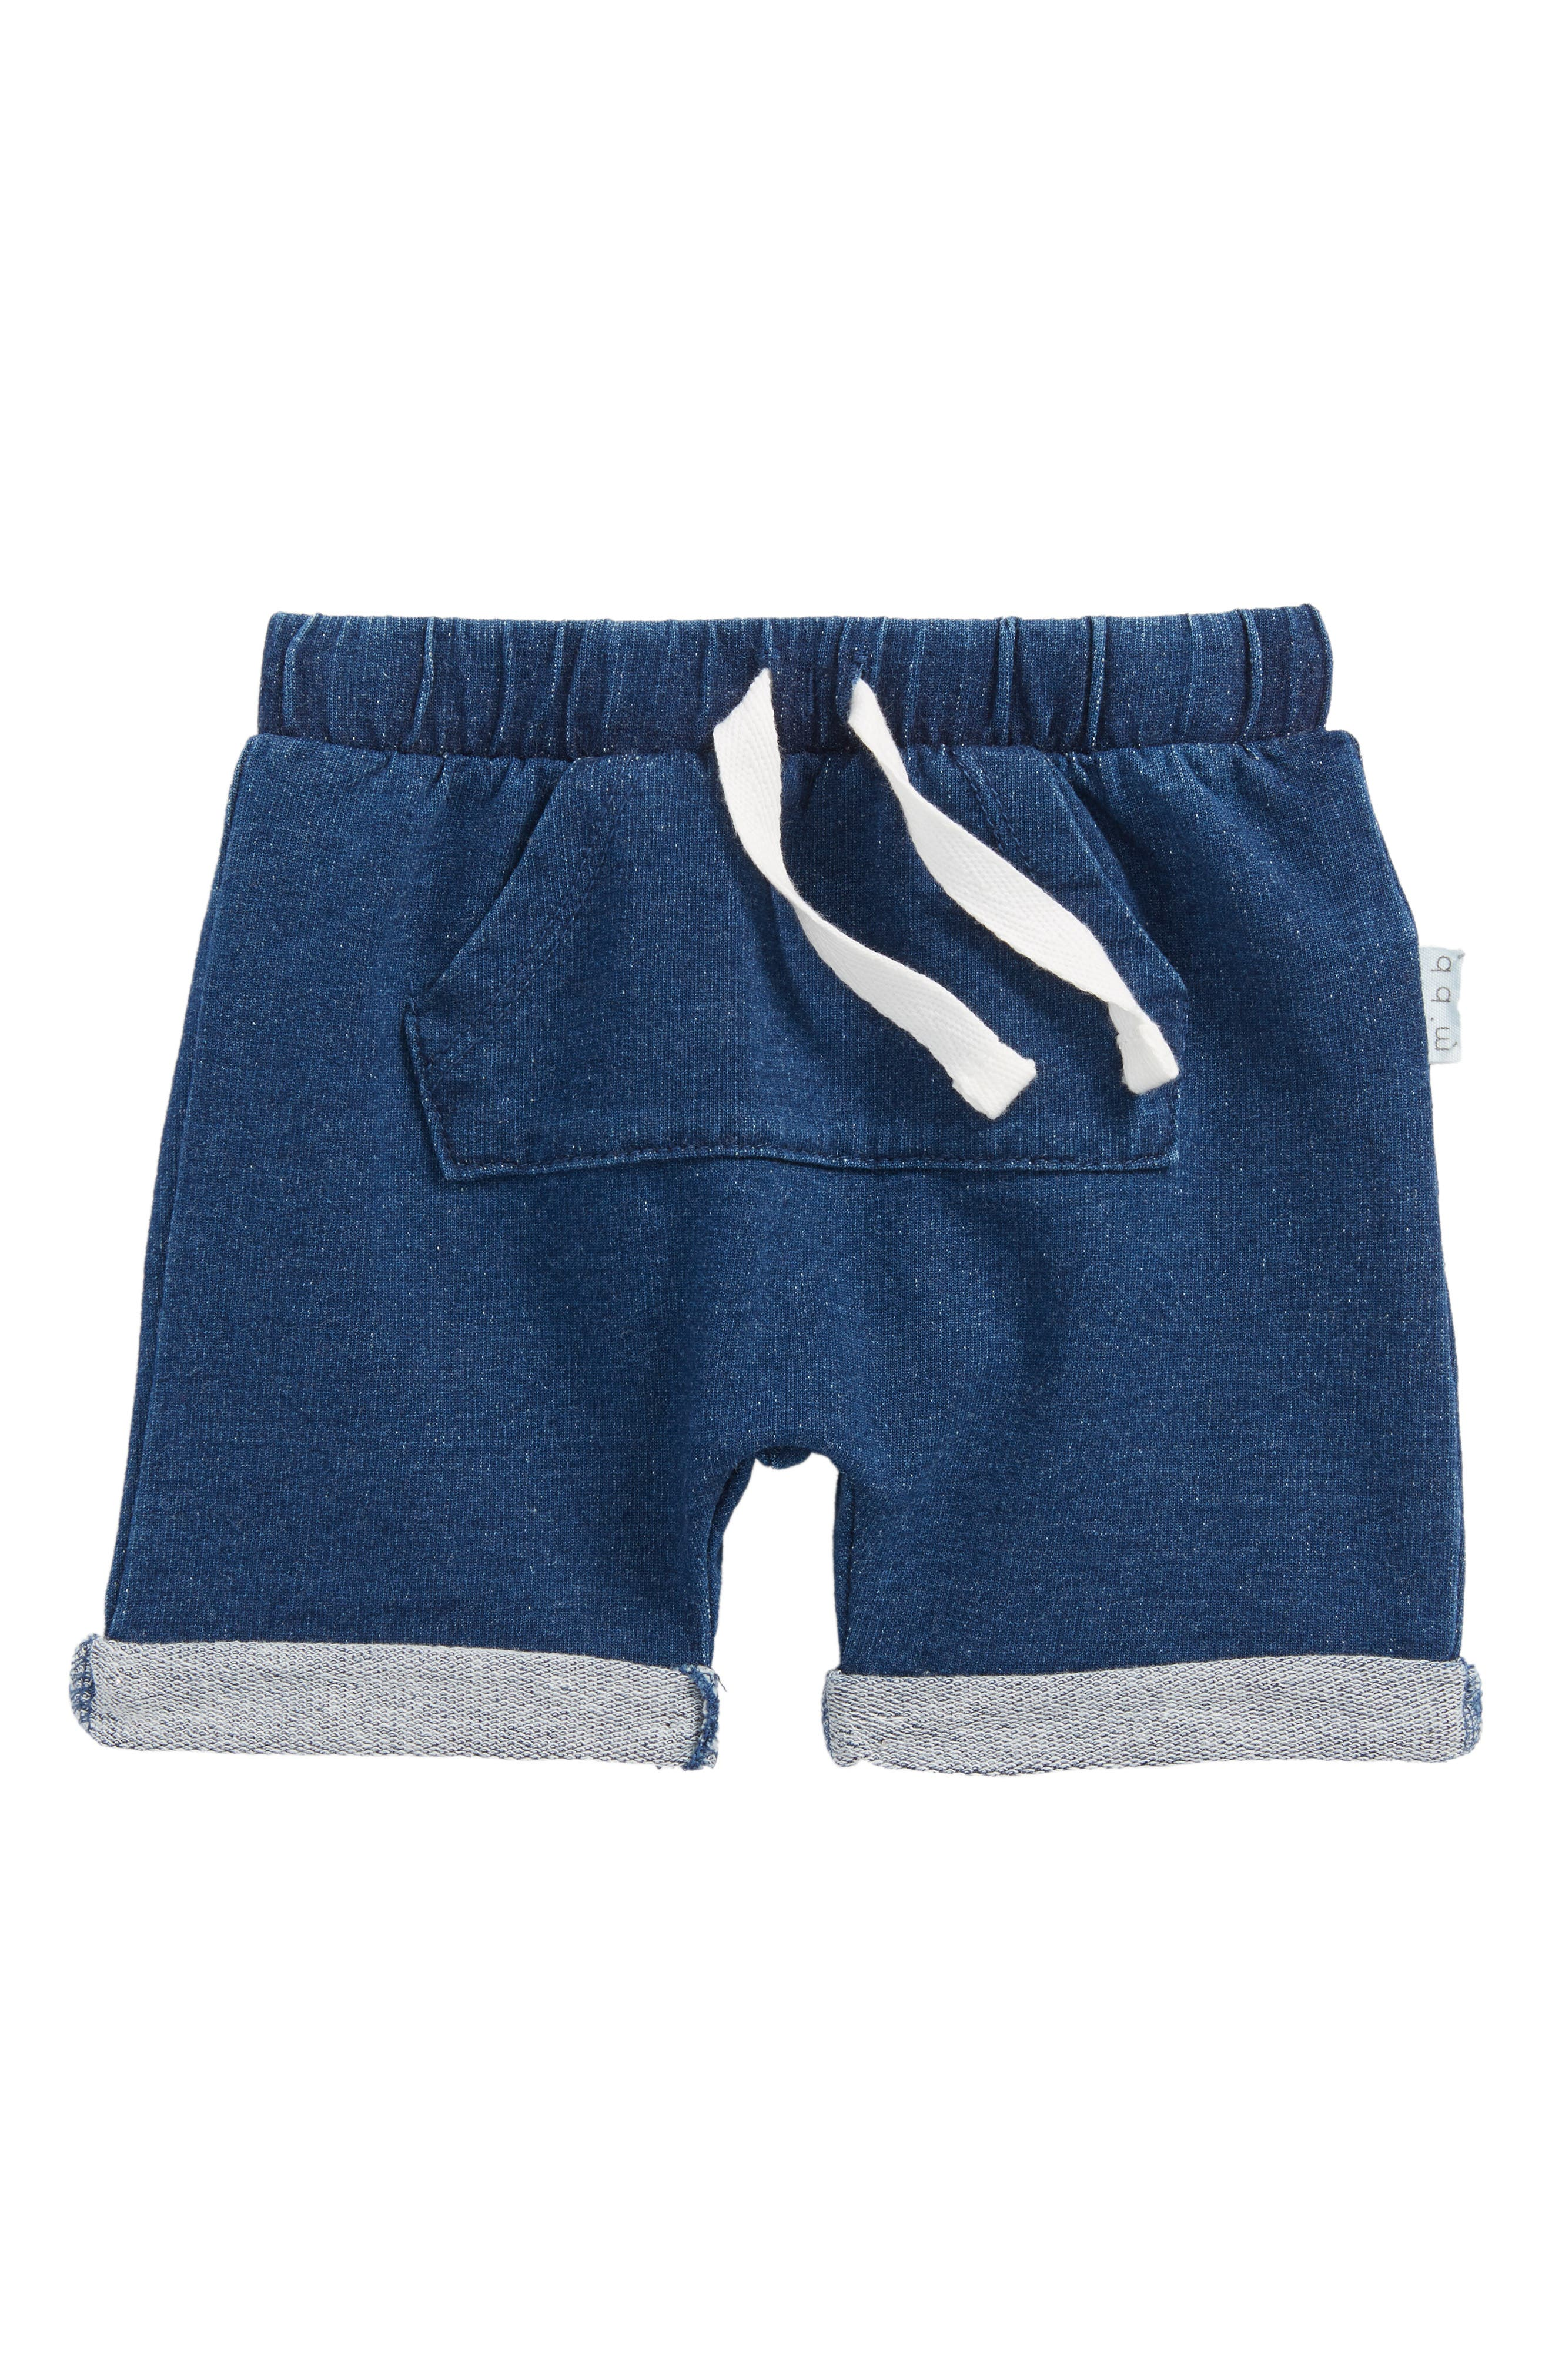 Denim Look Shorts,                         Main,                         color, Blue